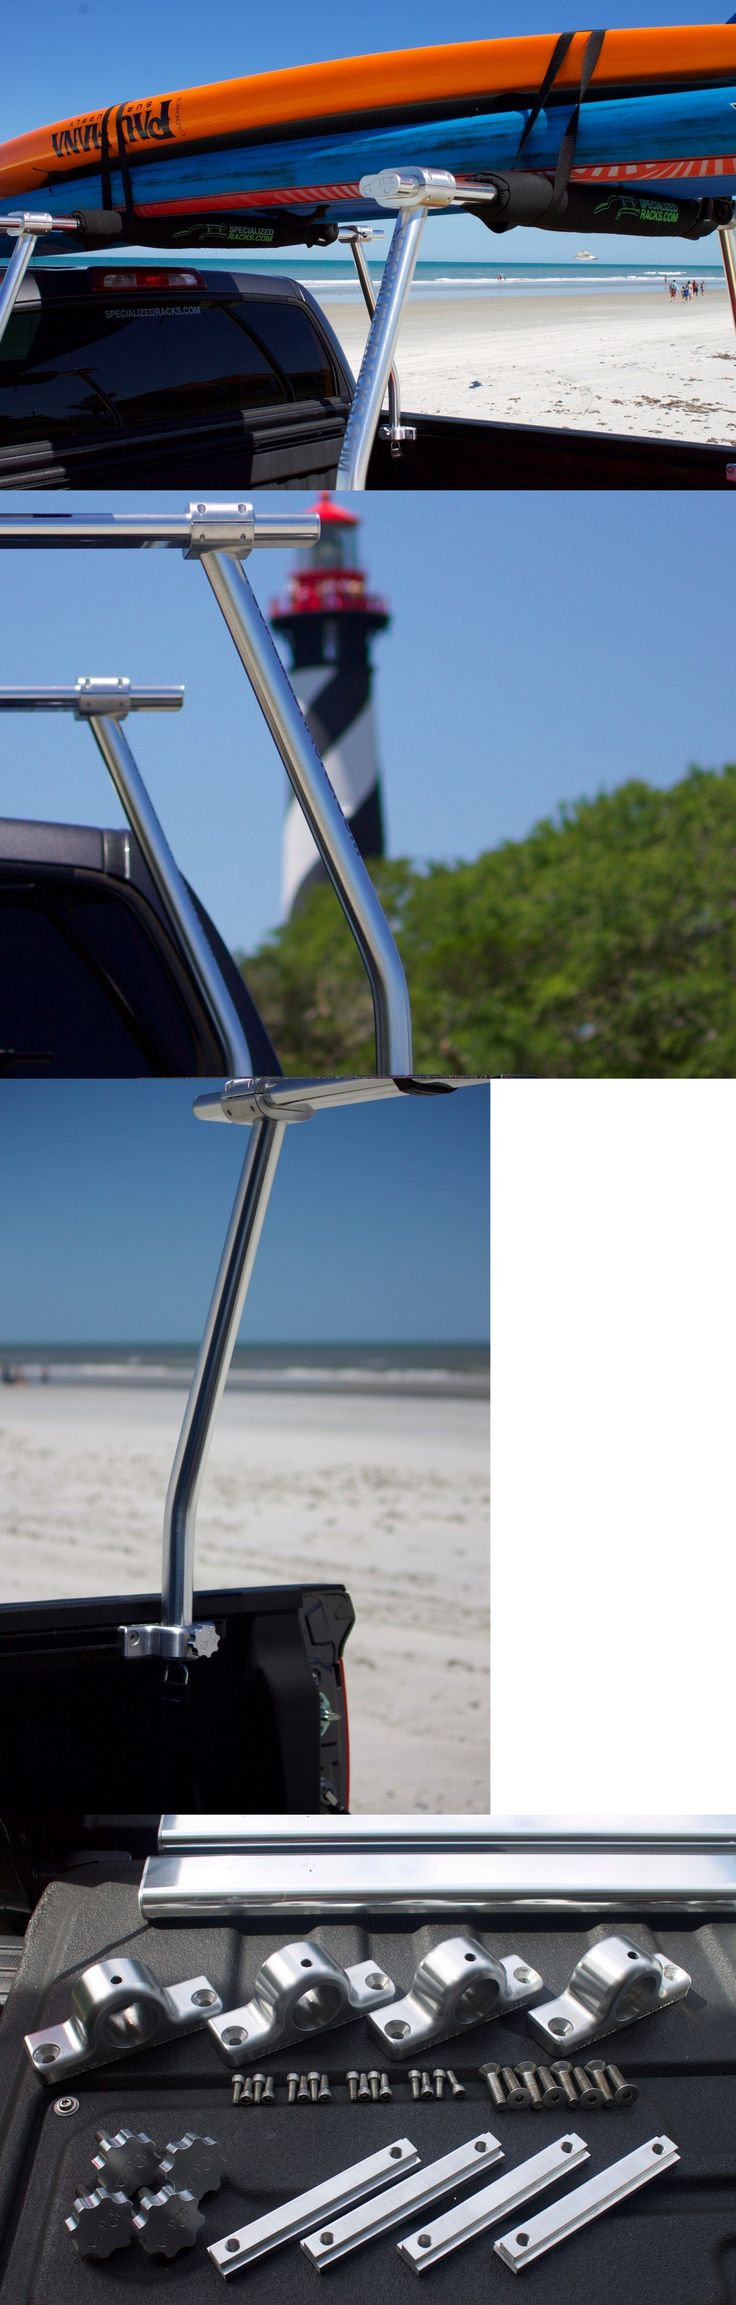 Car Racks 114254: Specialized Racks Surf Paddle Paddleboard Kayak Truck Rack -> BUY IT NOW ONLY: $899 on eBay!